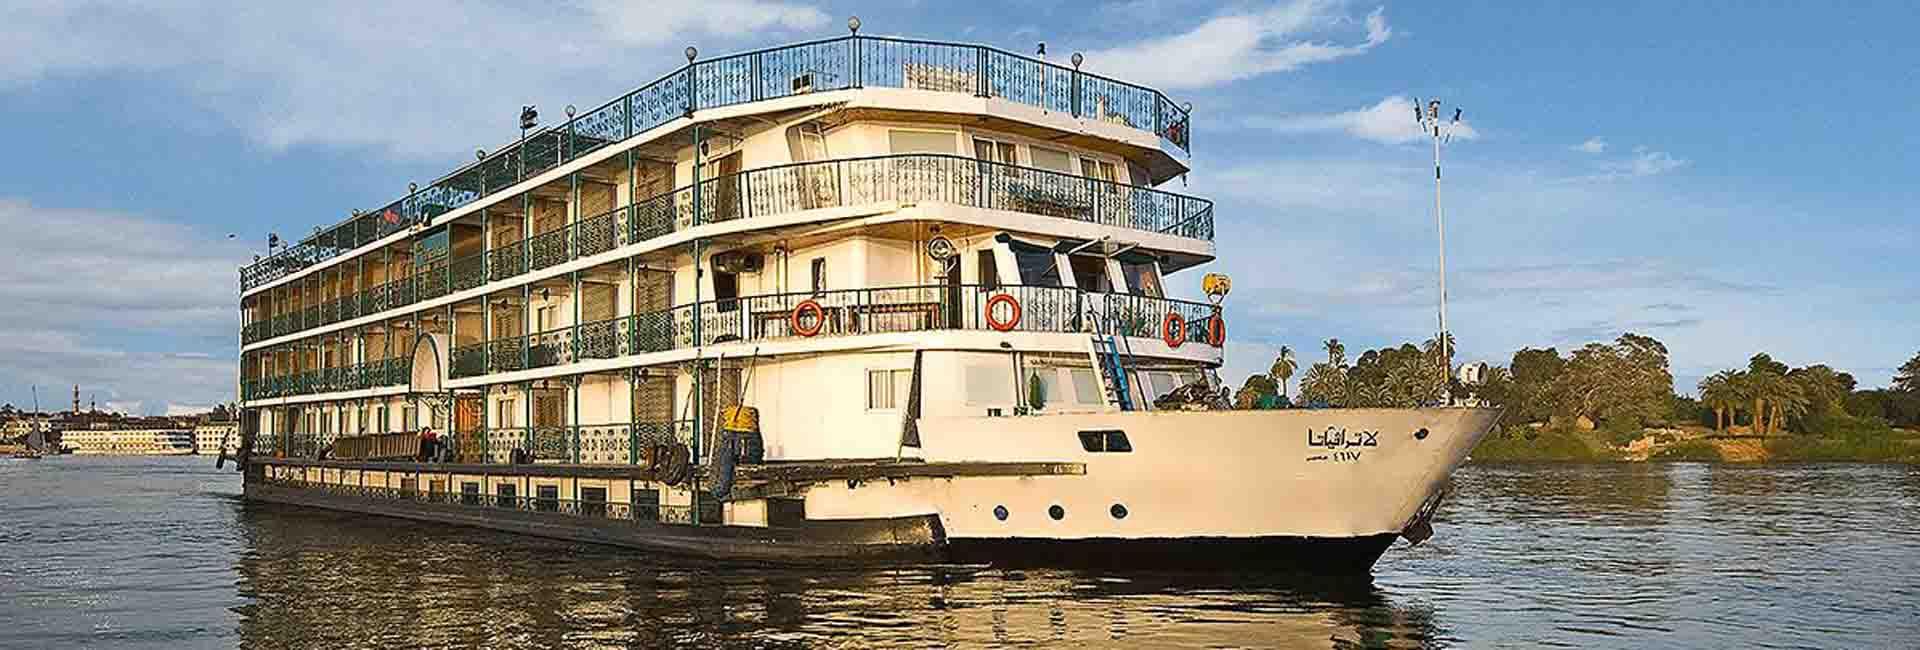 La Traviata Nile Cruise